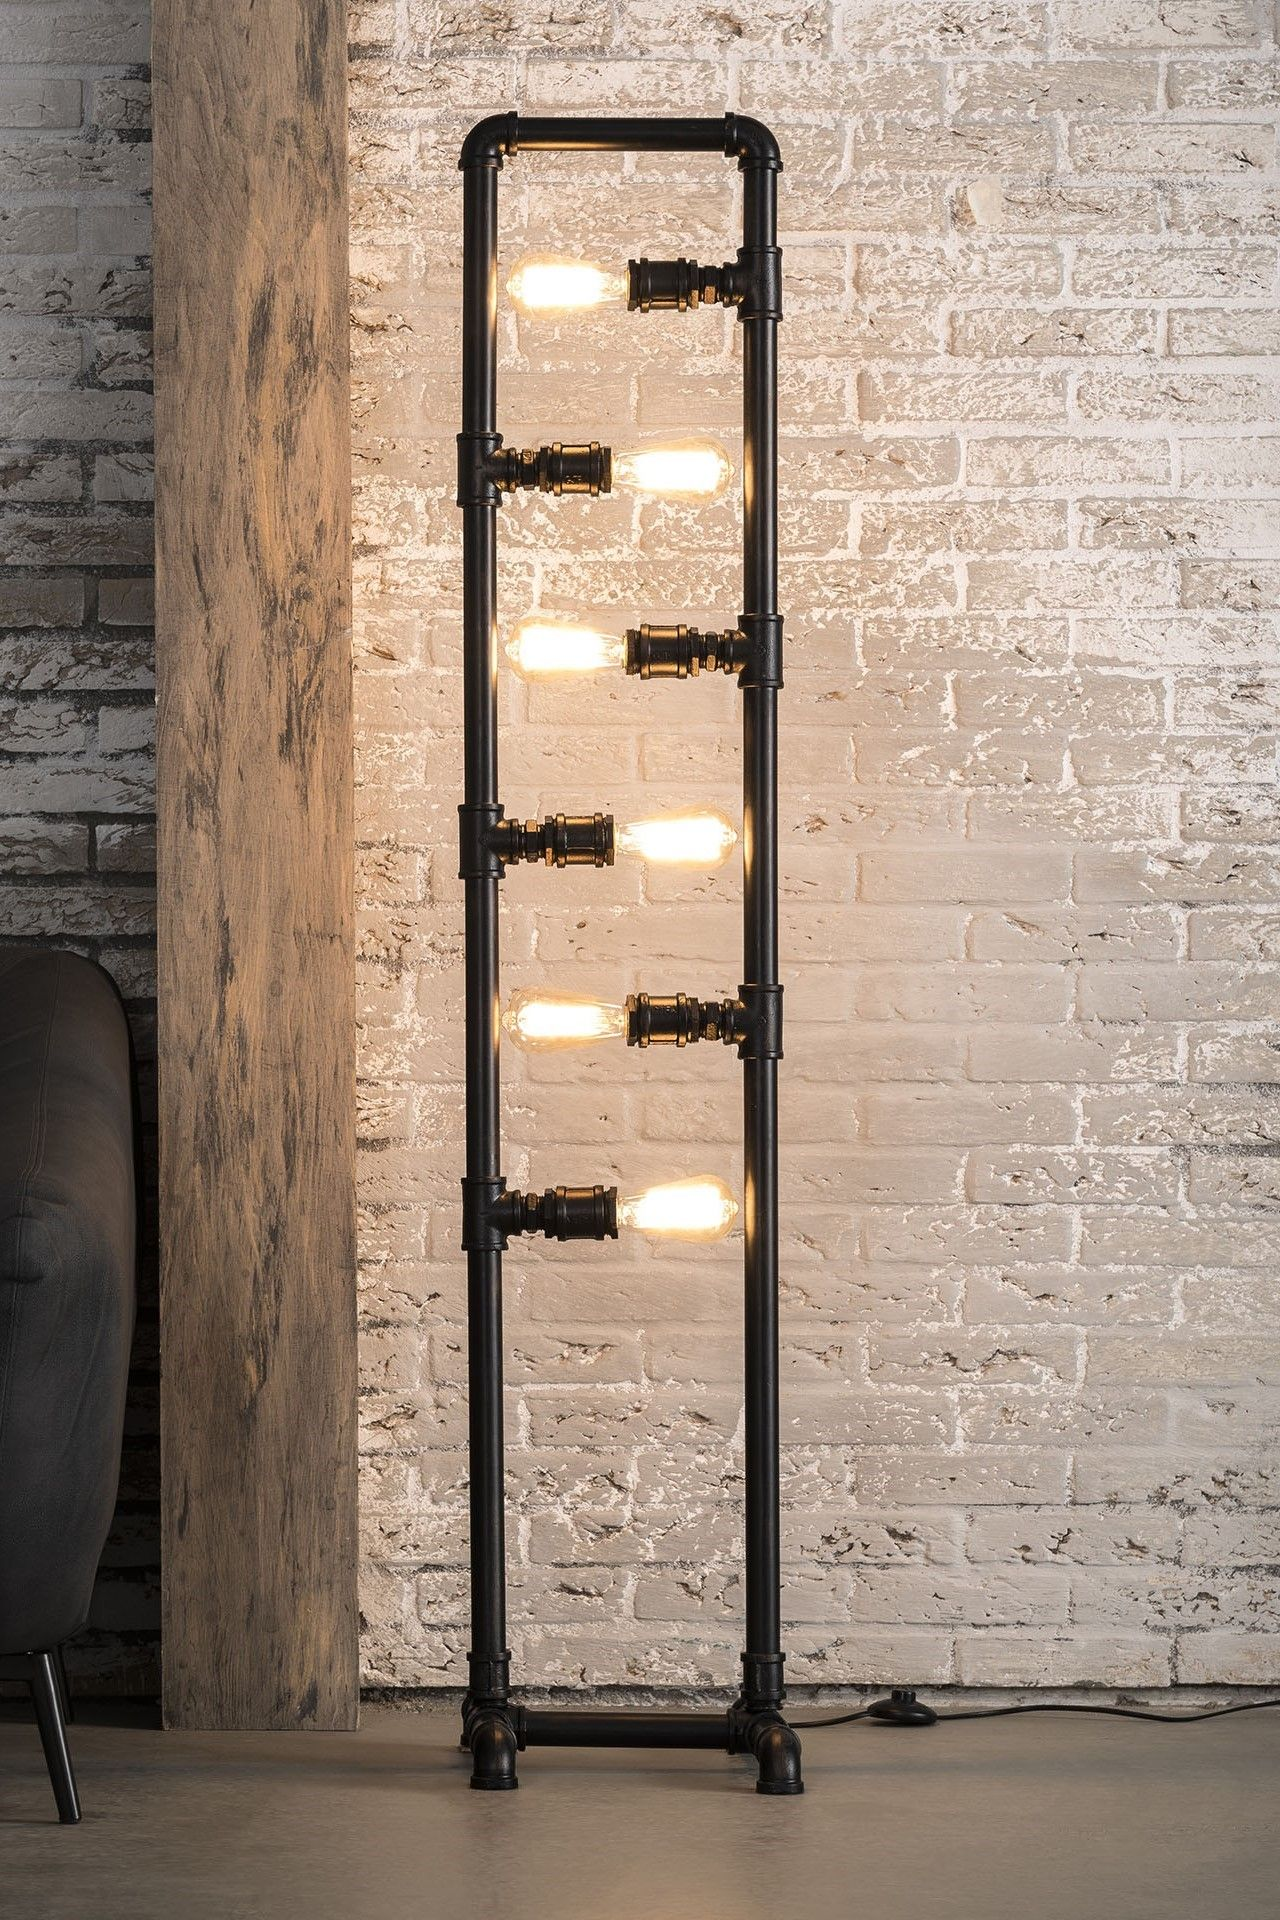 Wohnaura Lampen Design Industriedesign Lampen Coole